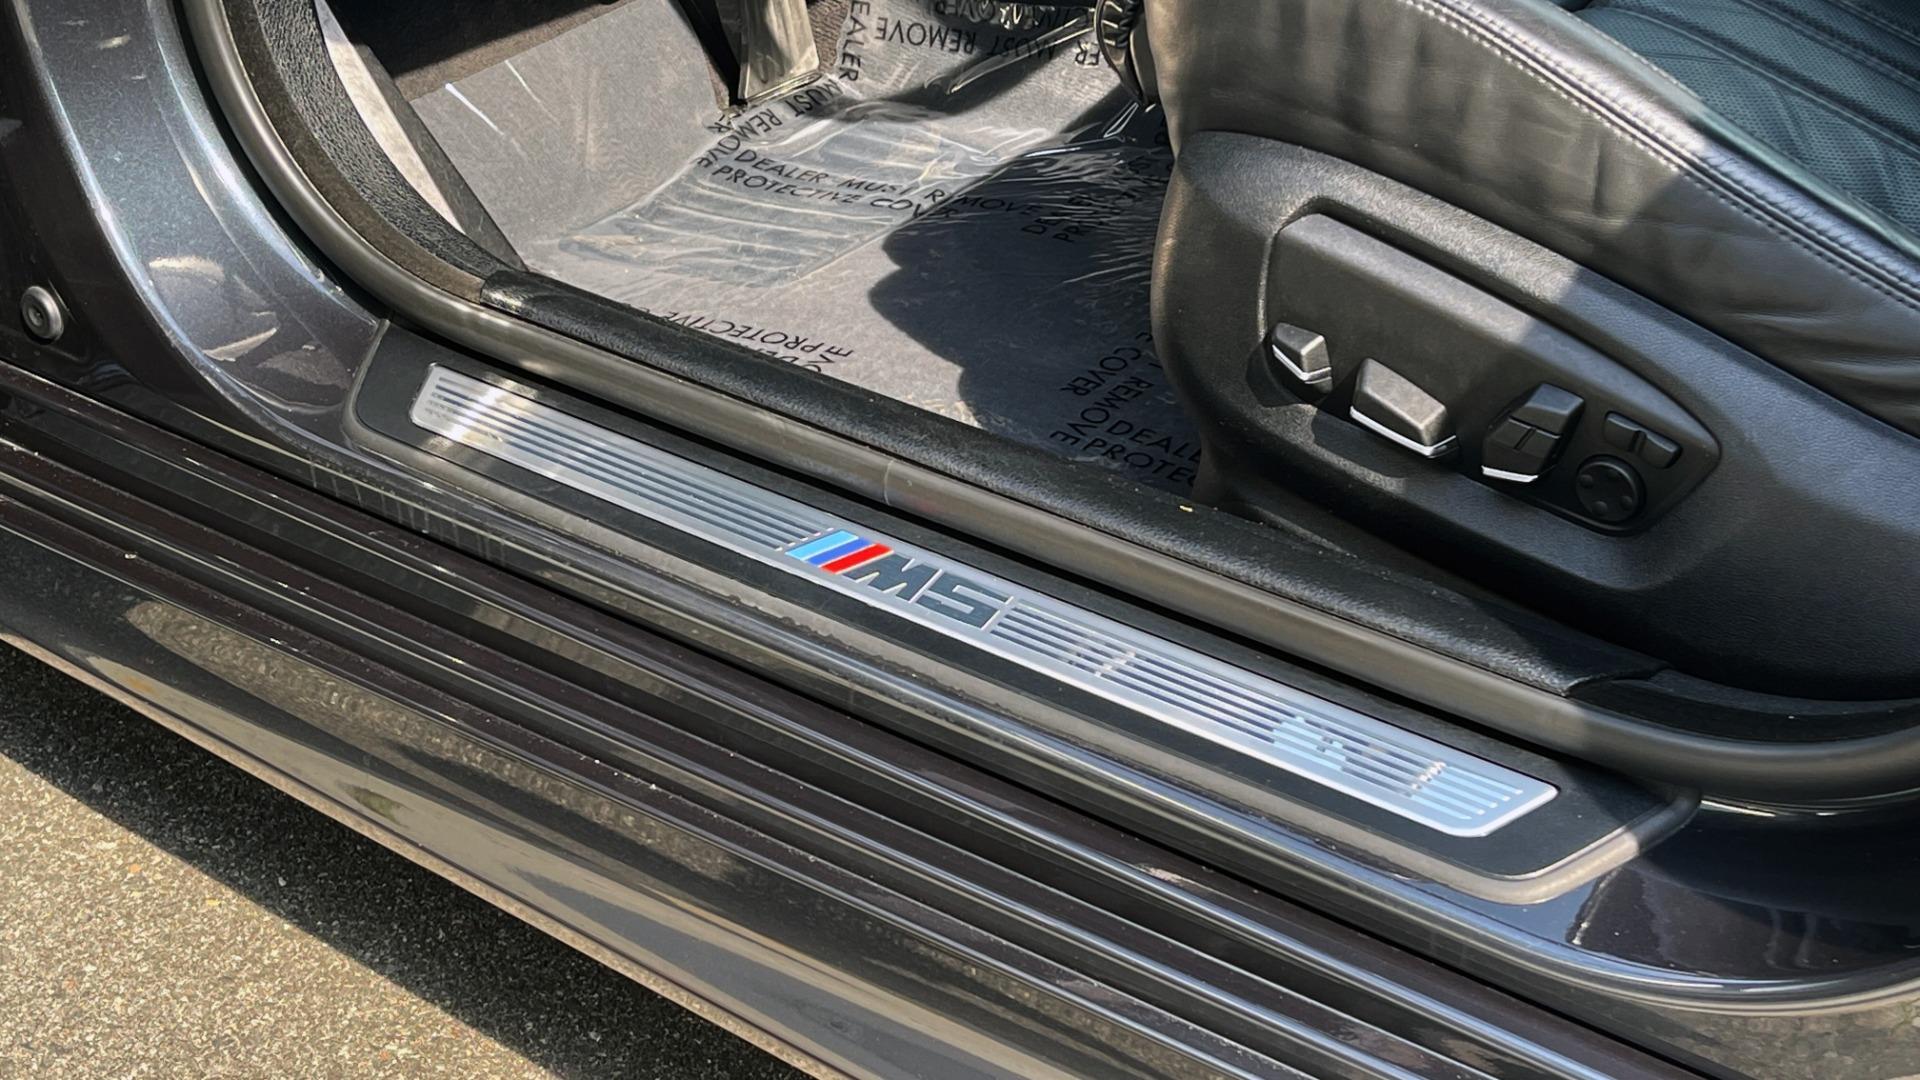 Used 2015 BMW M5 SEDAN / EXEC PKG / HUD / NAV / B&O SND / SUNROOF / REARVIEW for sale Sold at Formula Imports in Charlotte NC 28227 39